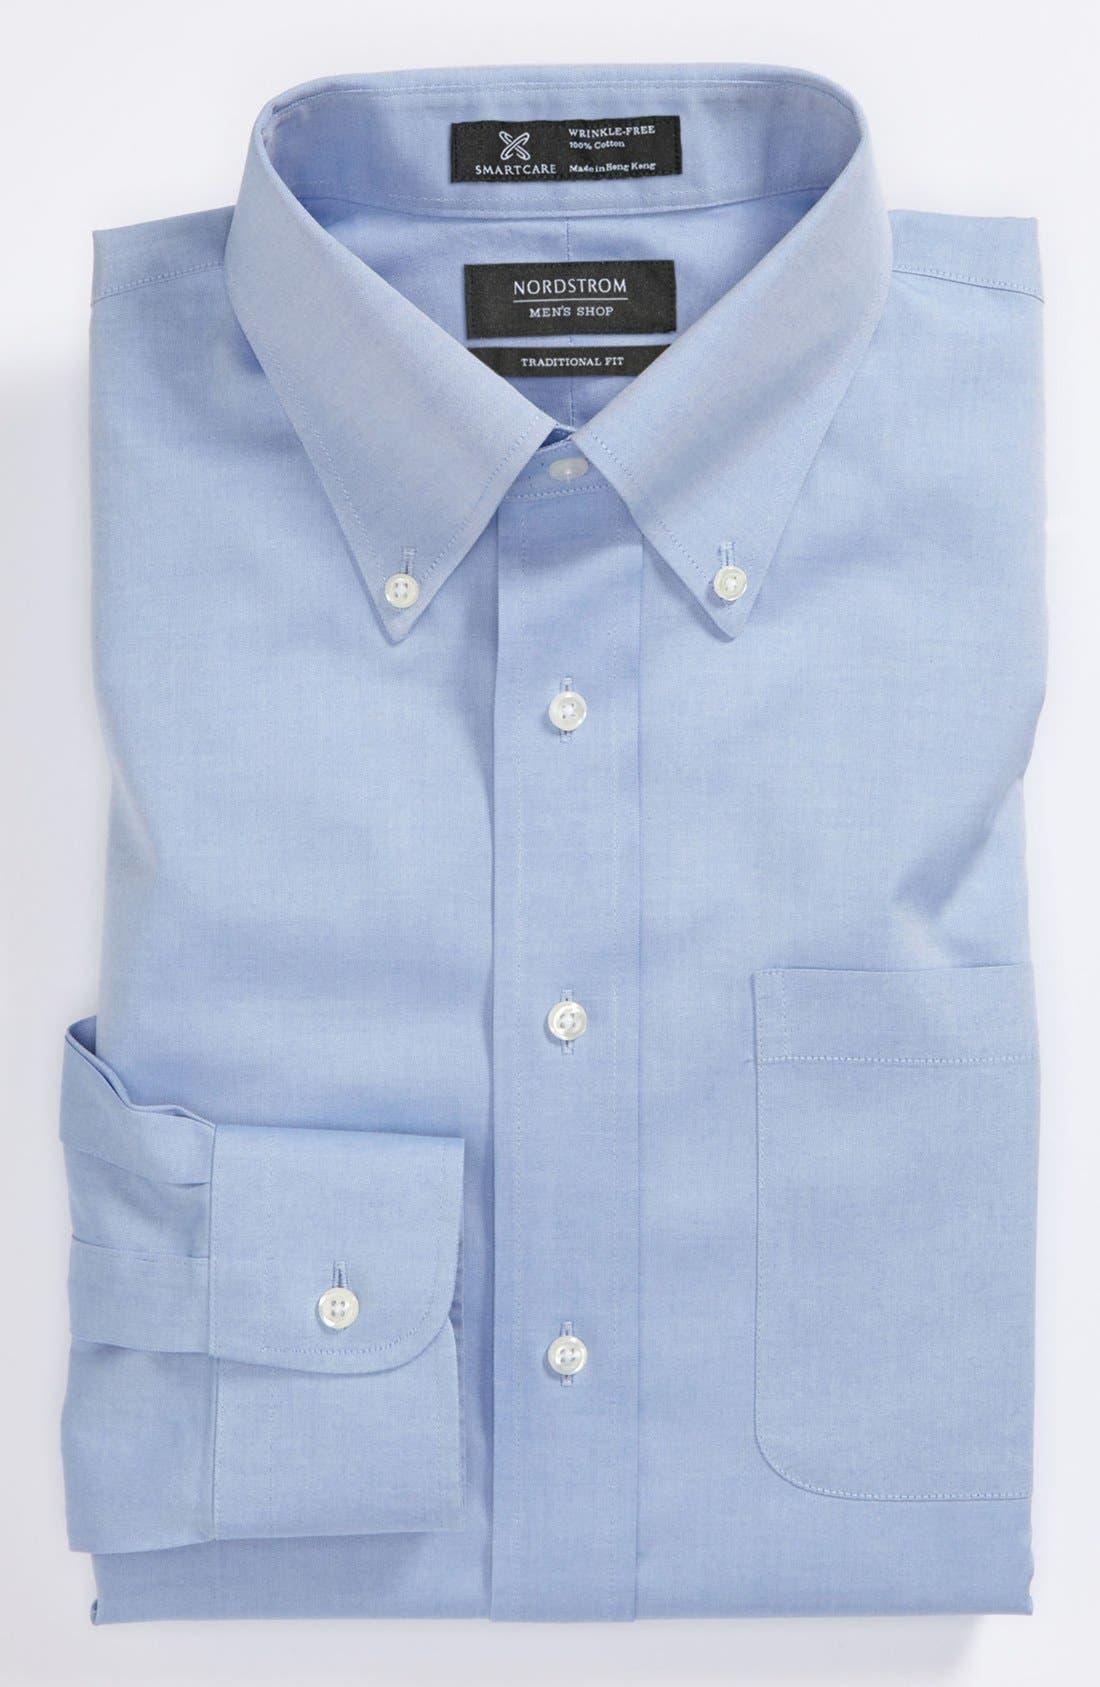 NORDSTROM MEN'S SHOP Smartcare™ Traditional Fit Pinpoint Dress